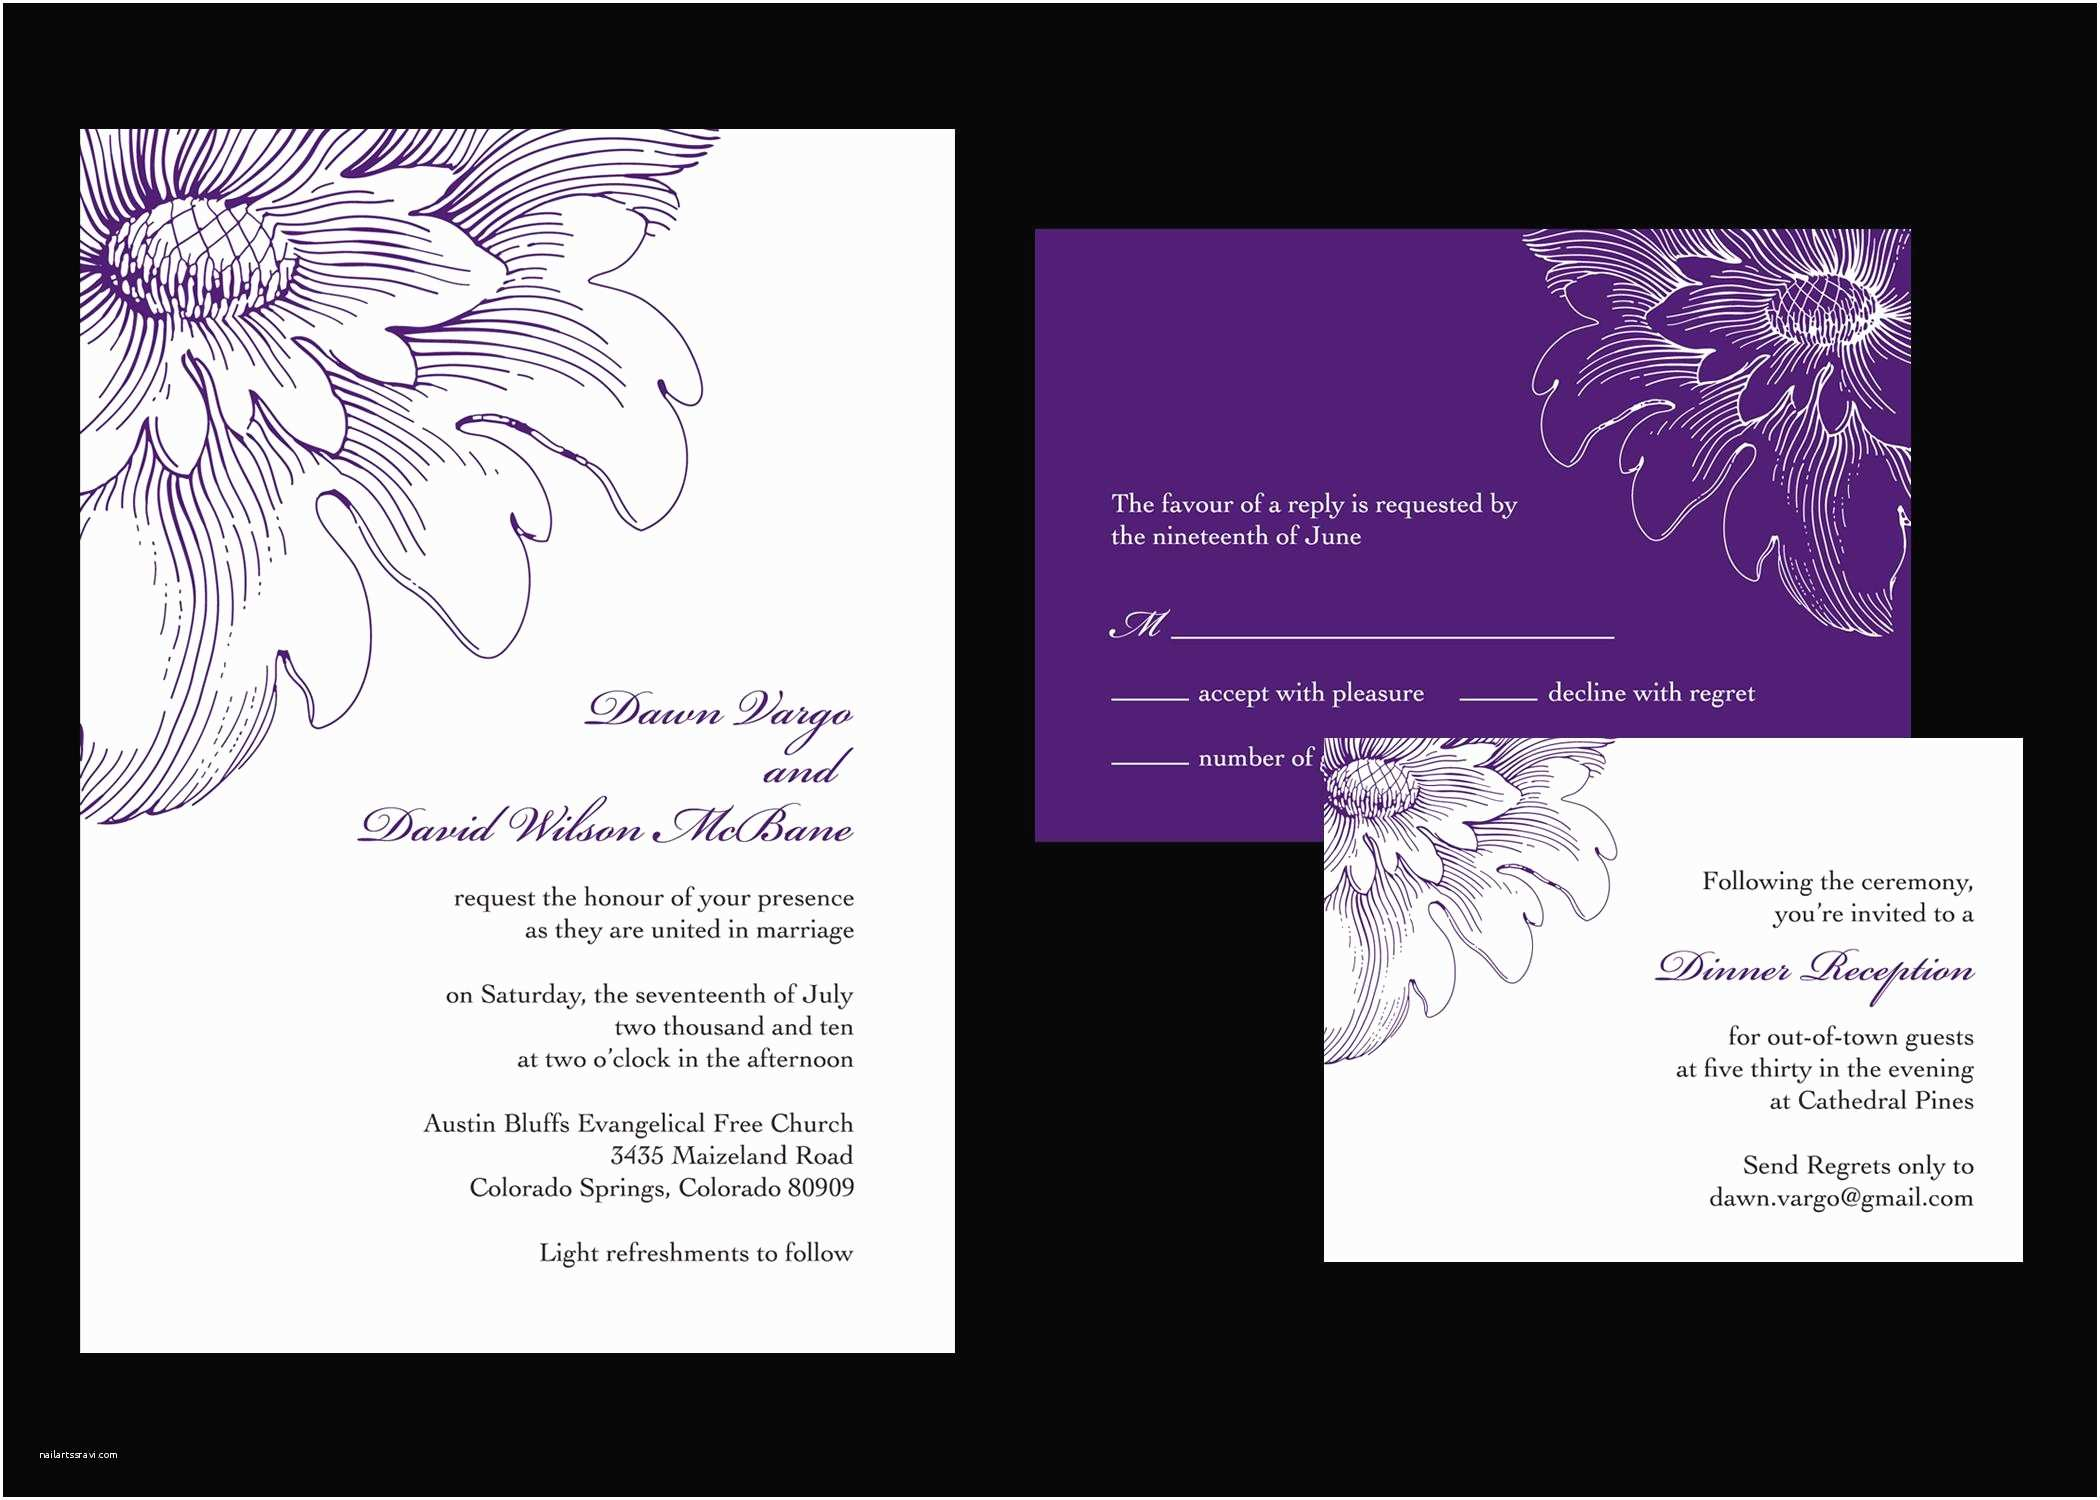 Wedding Invitations with Rsvp Wedding Invitation Wedding Invitations and Response